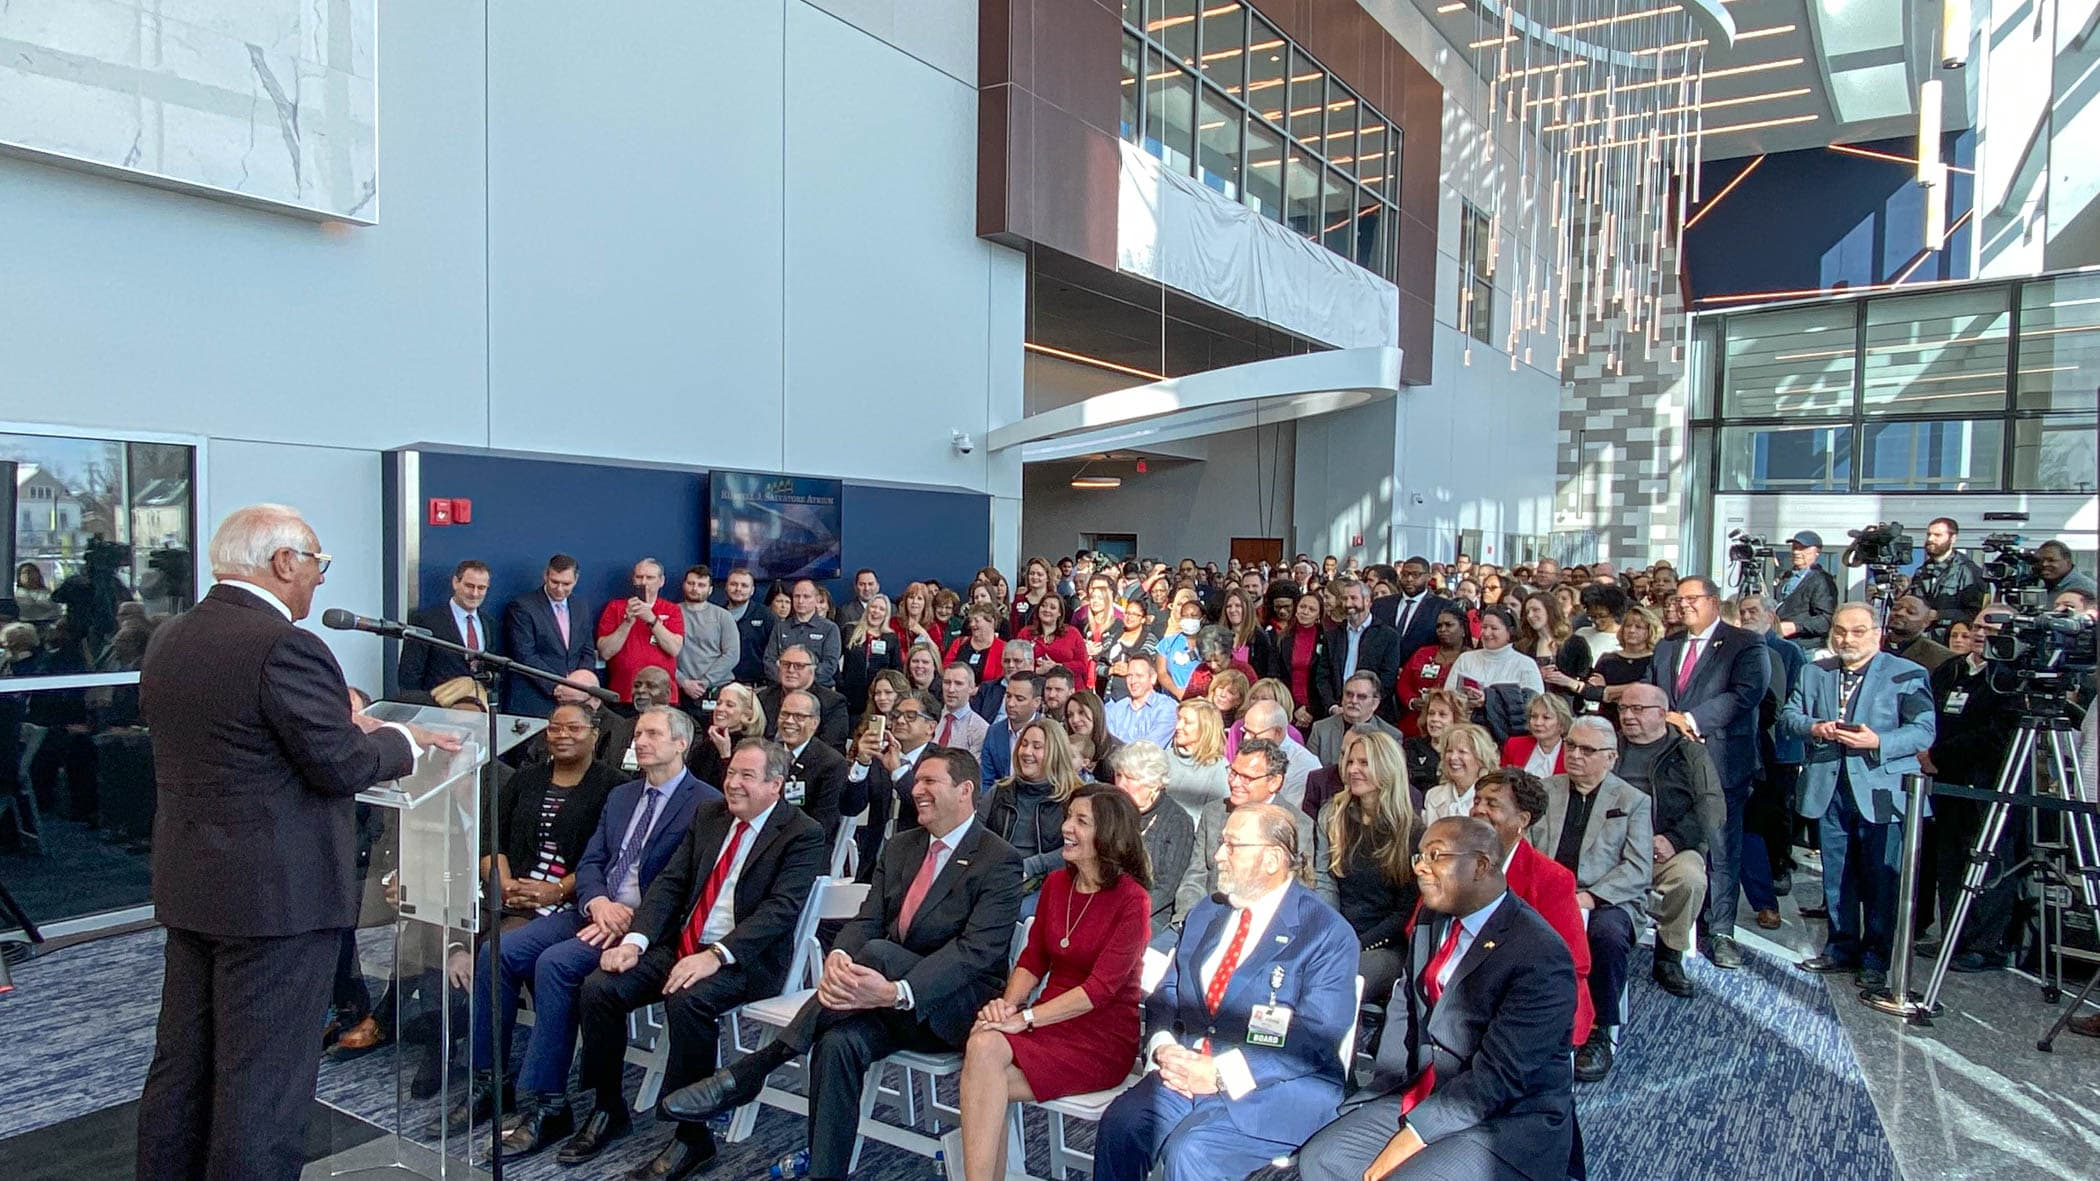 20200214 RJS Atrium Opening-1587